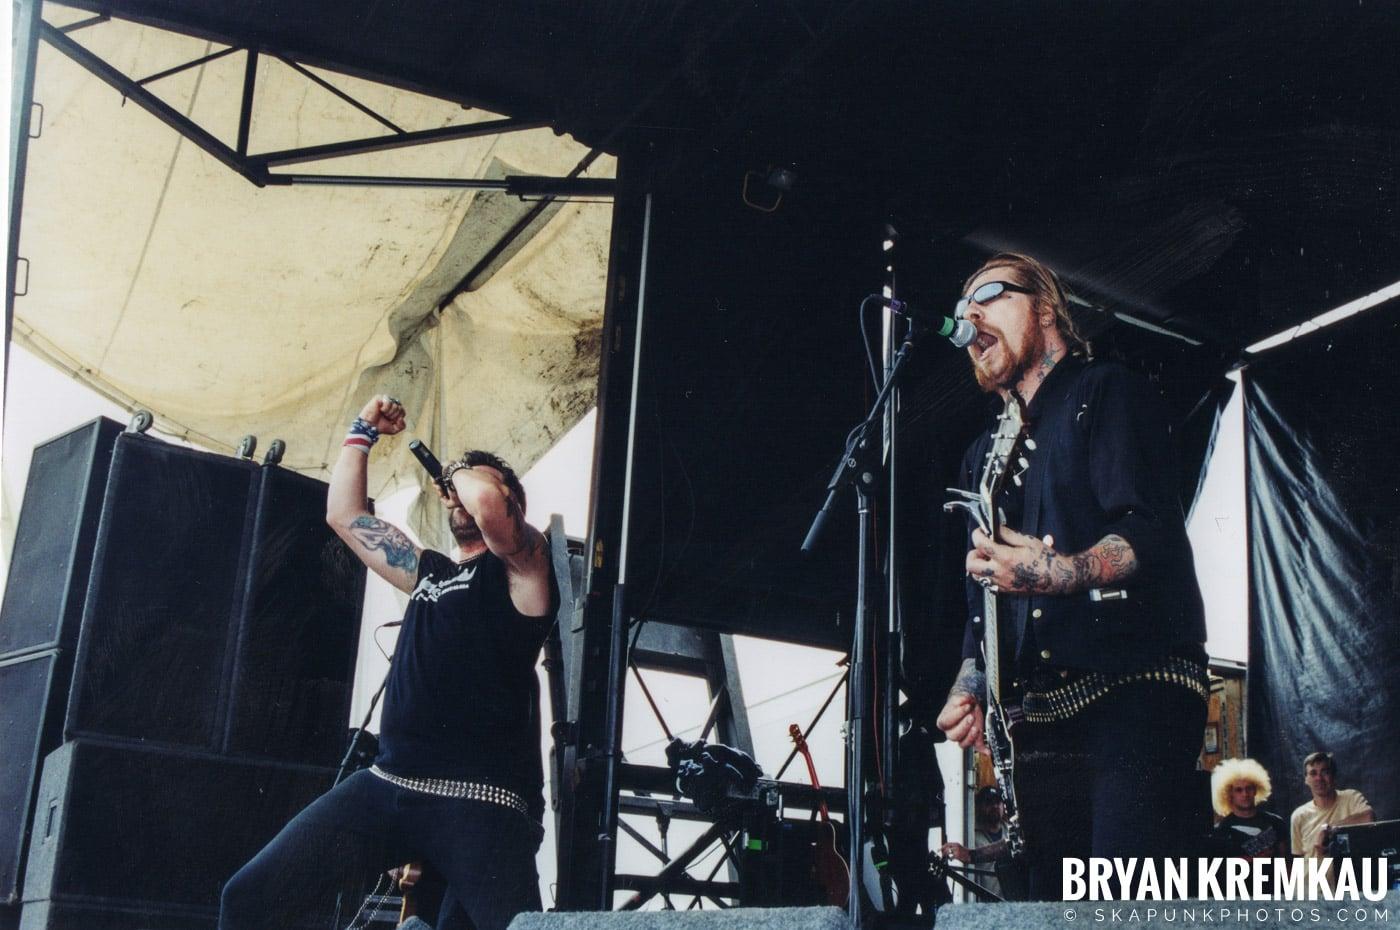 Lars Frederiksen and the Bastards @ Vans Warped Tour, Randall's Island, NYC - 8.7.04 (8)